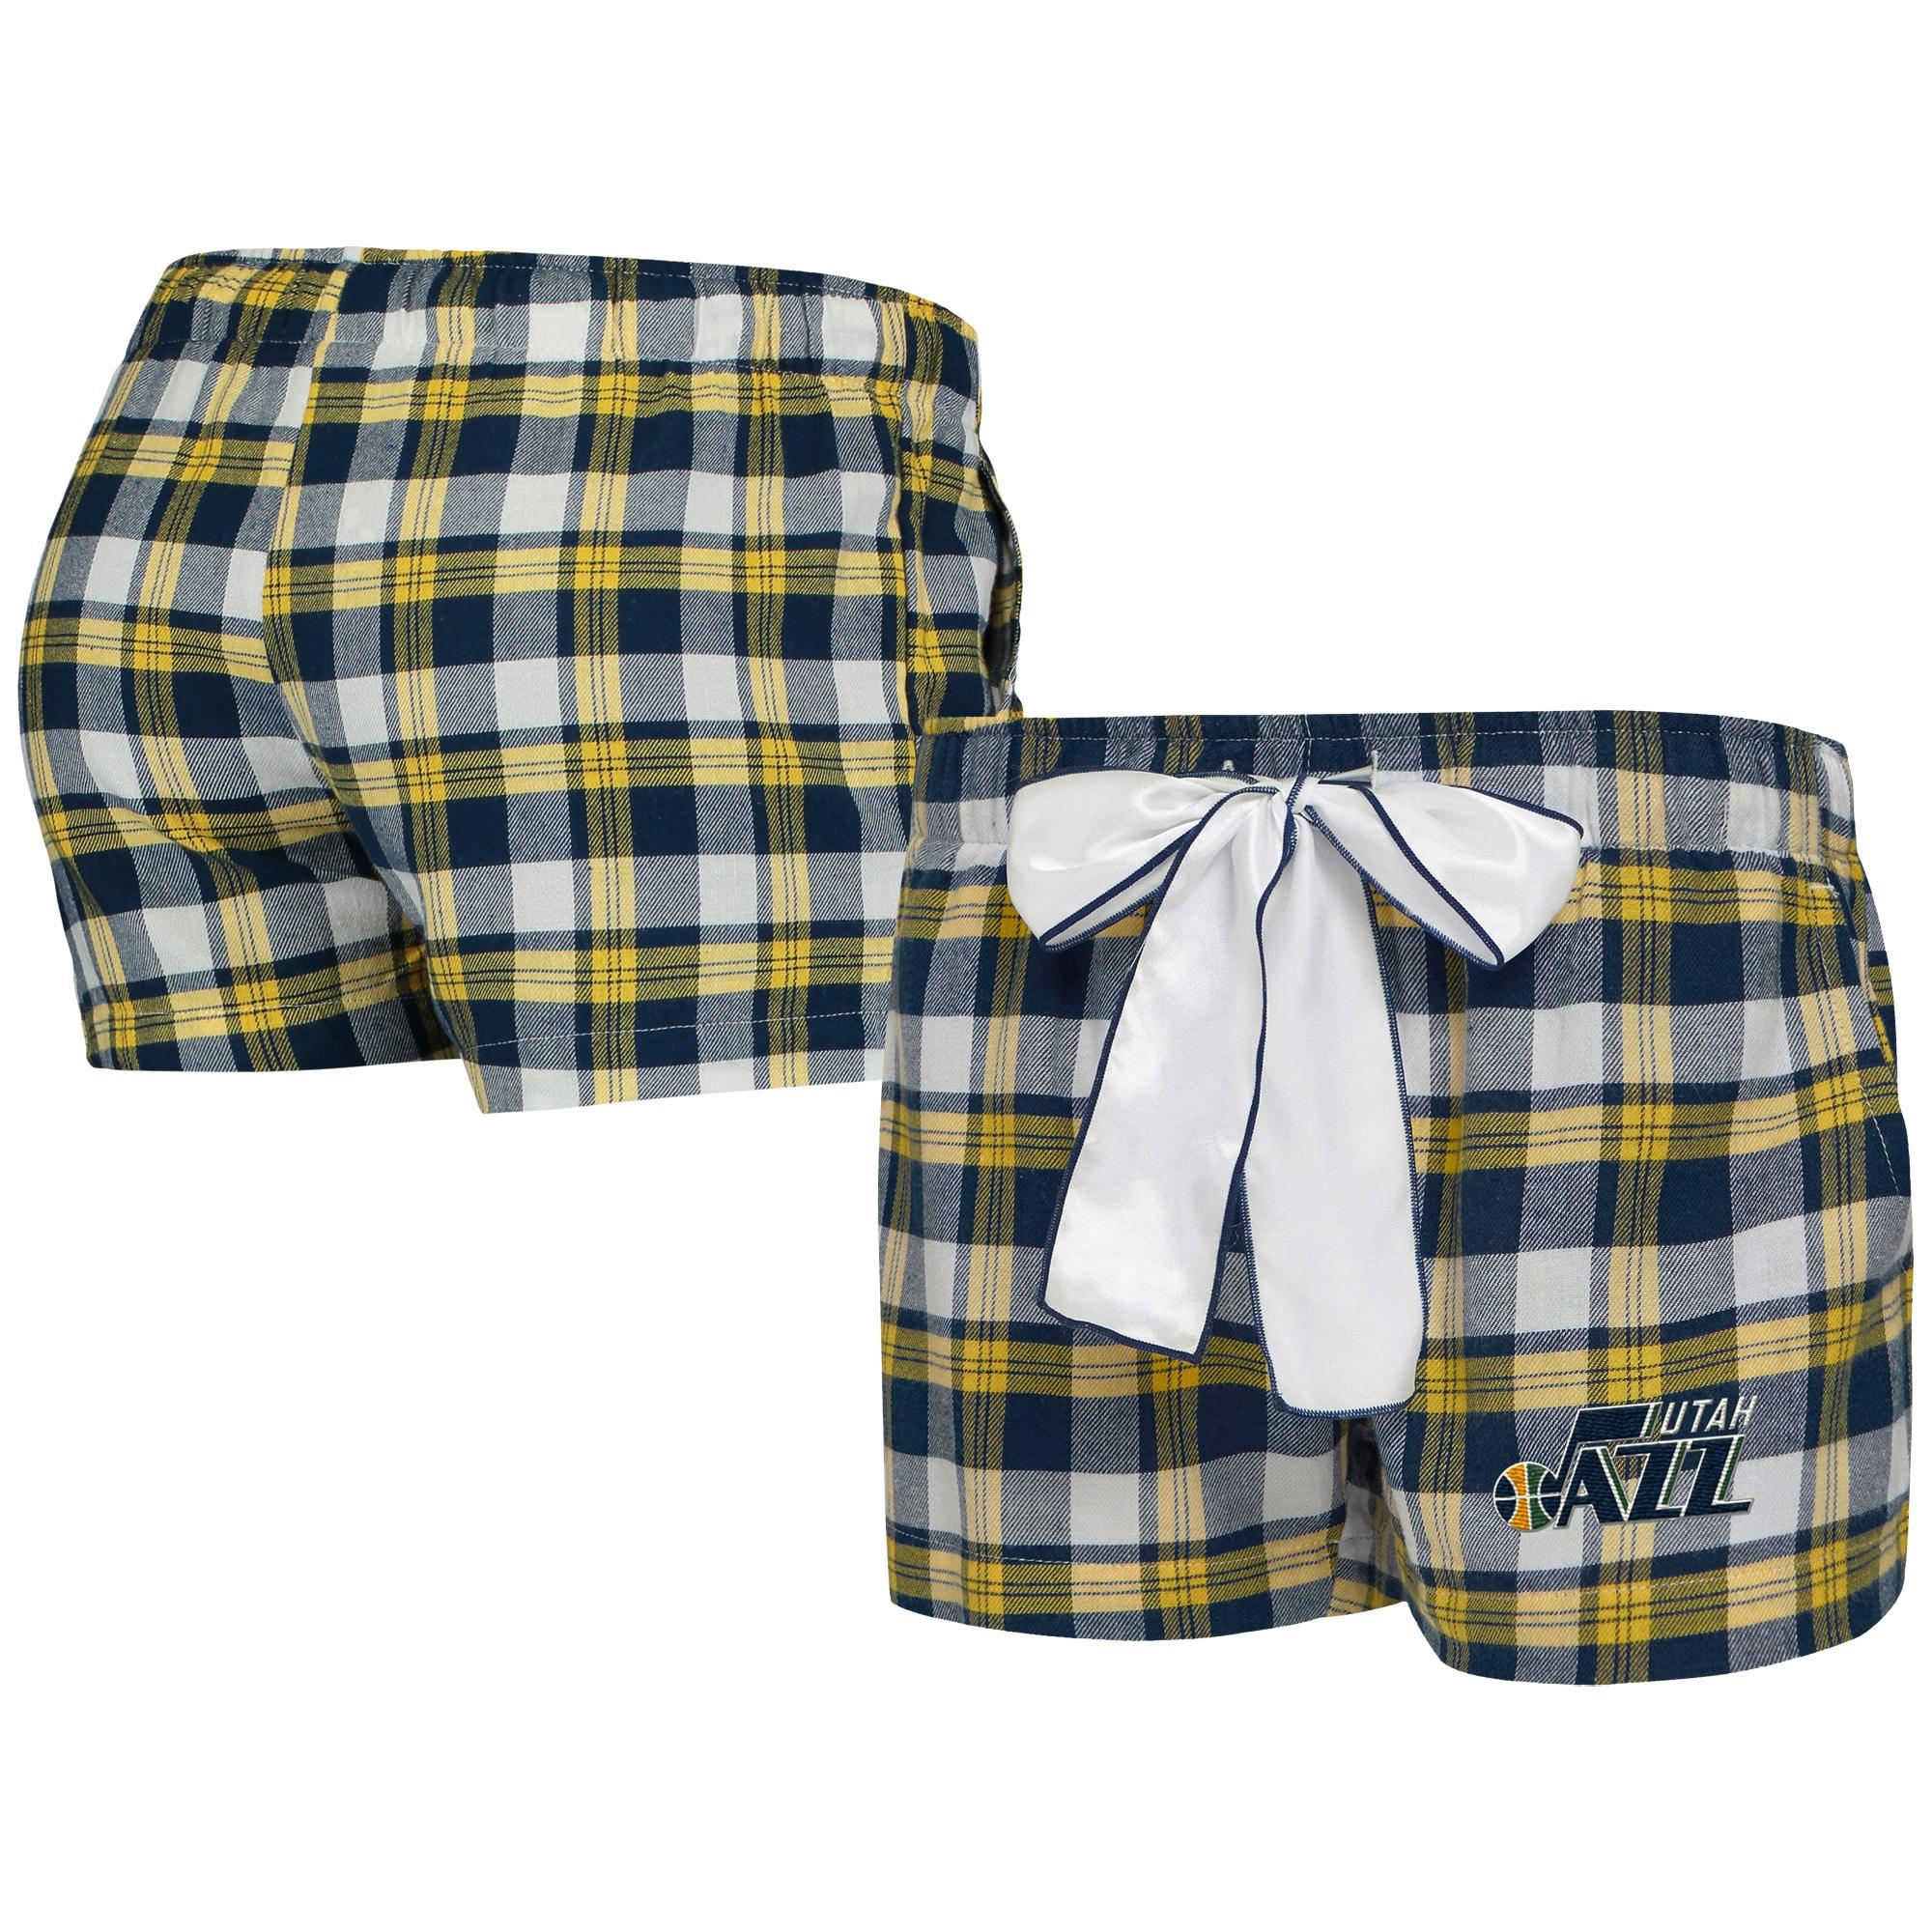 Utah Jazz Concepts Sport Women's Piedmont Flannel Sleep Shorts - Navy/Gold